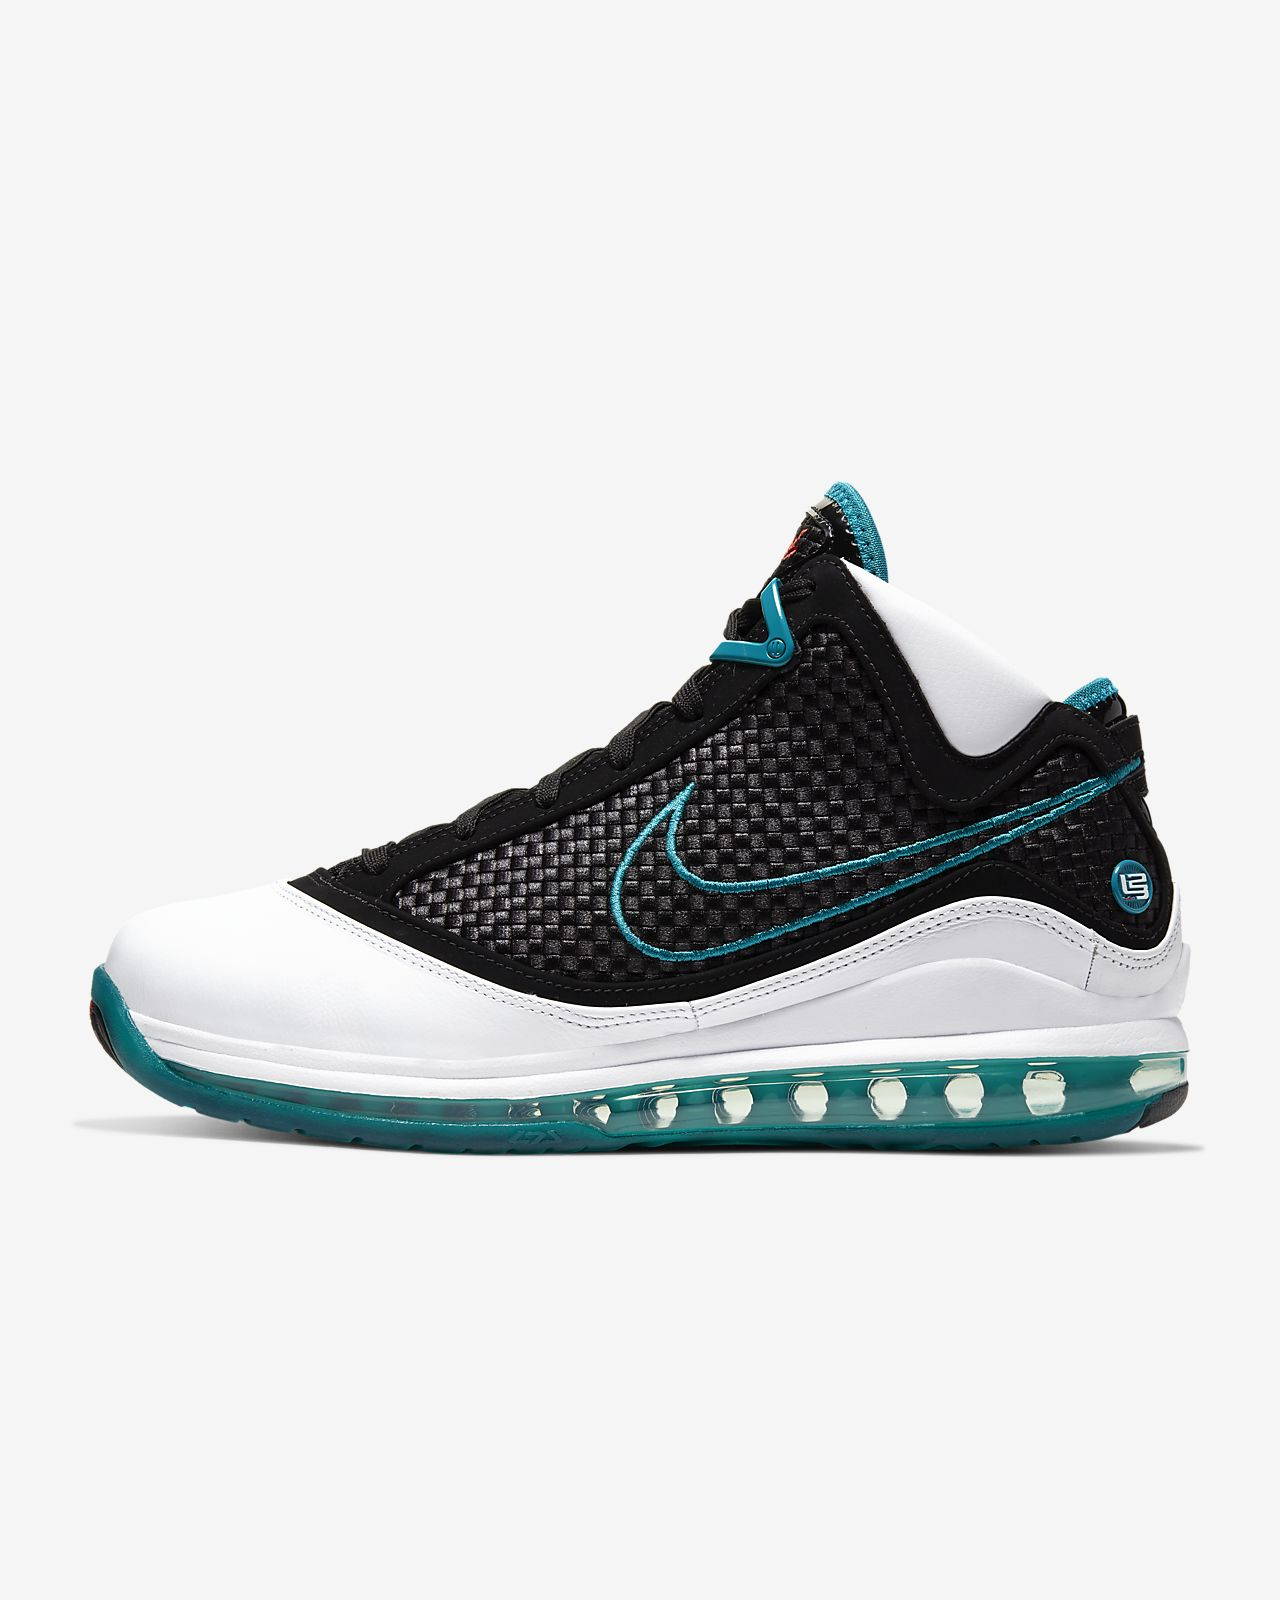 Chaussure LeBron 7 pour Homme